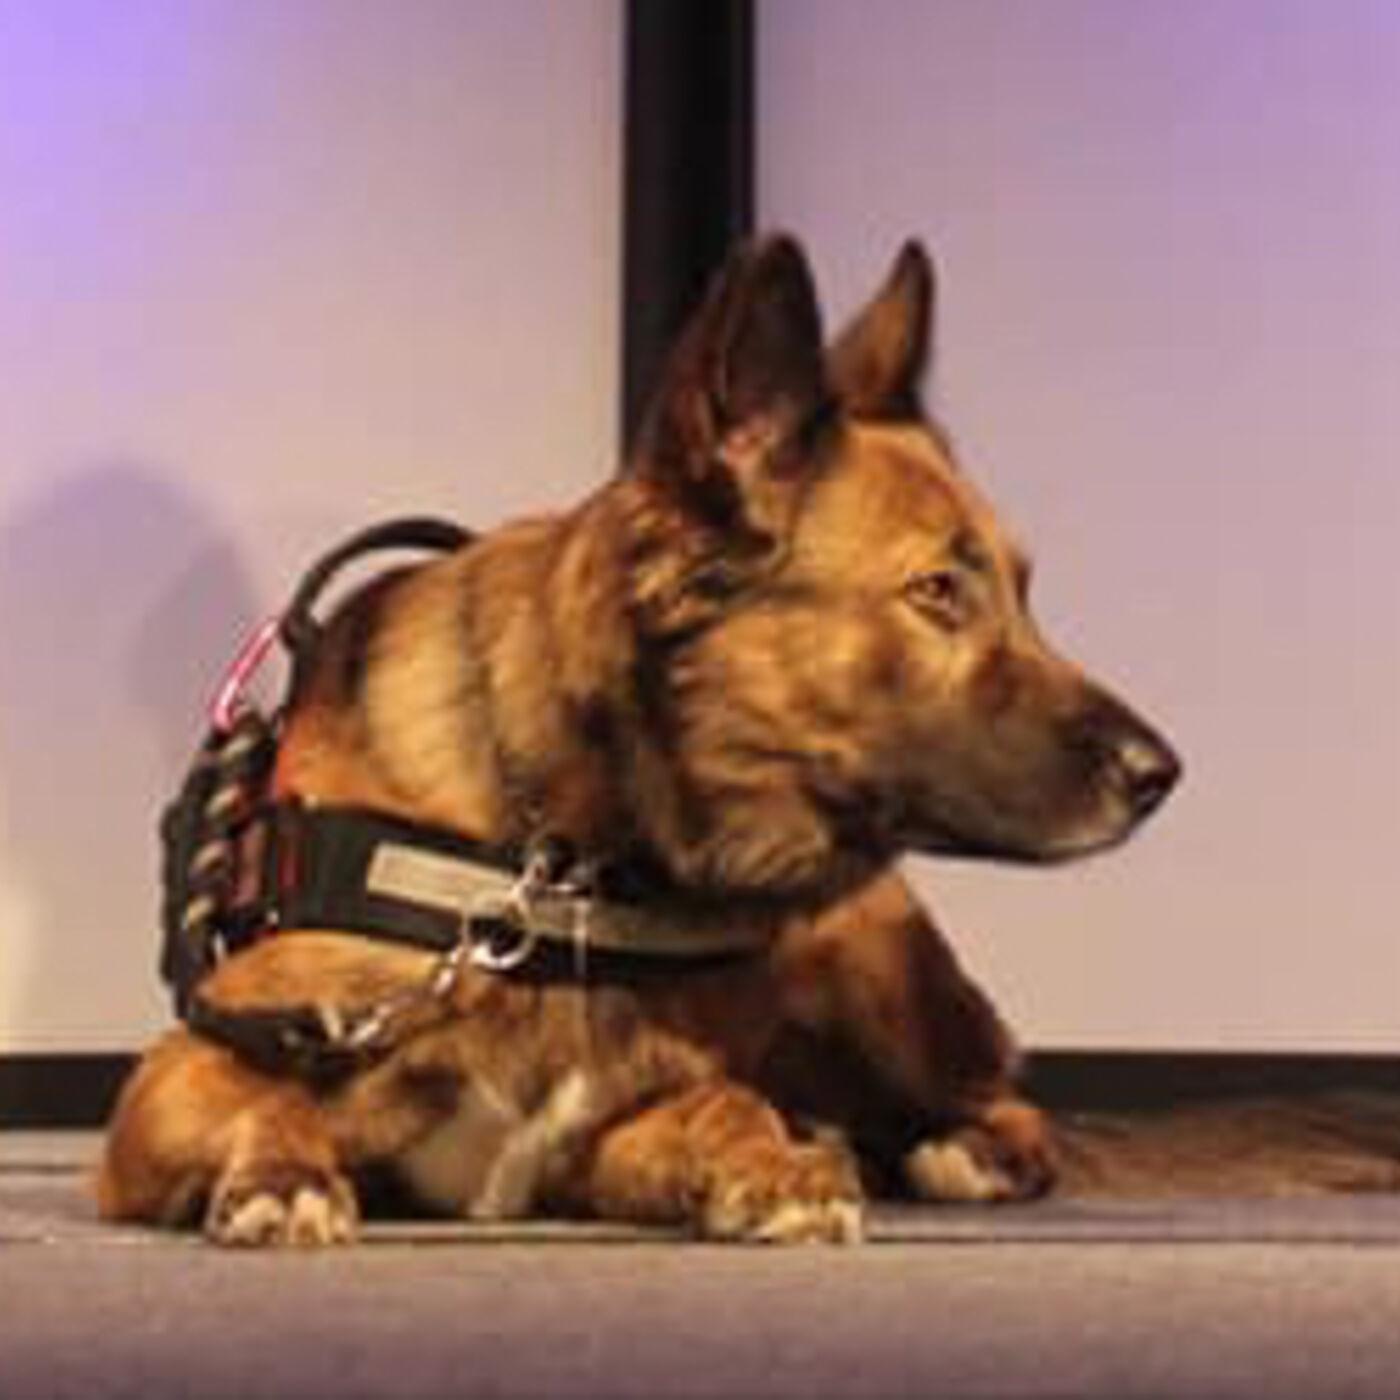 0151: Training Service Dogs with Jason and Sandra Sindeldecker